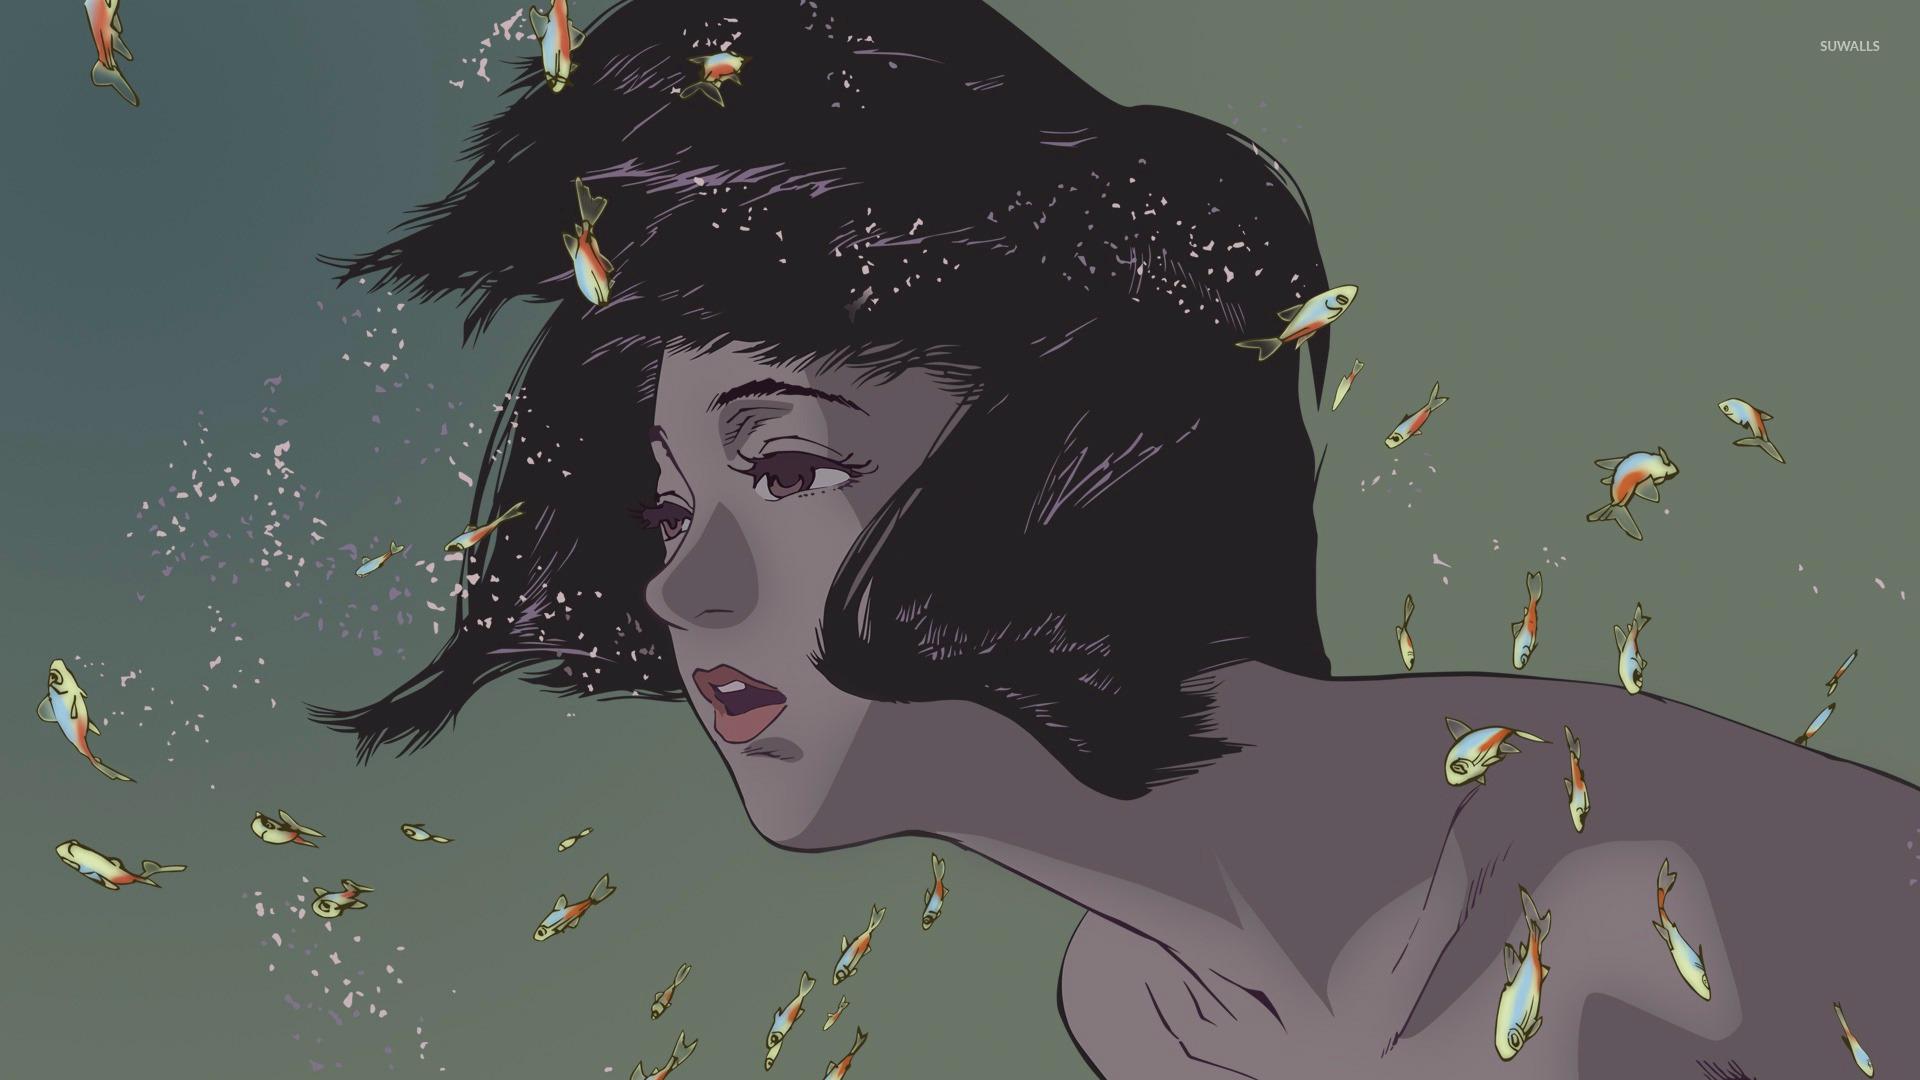 Mima Kirigoe  Perfect Blue Wallpaper Anime Wallpapers 43947